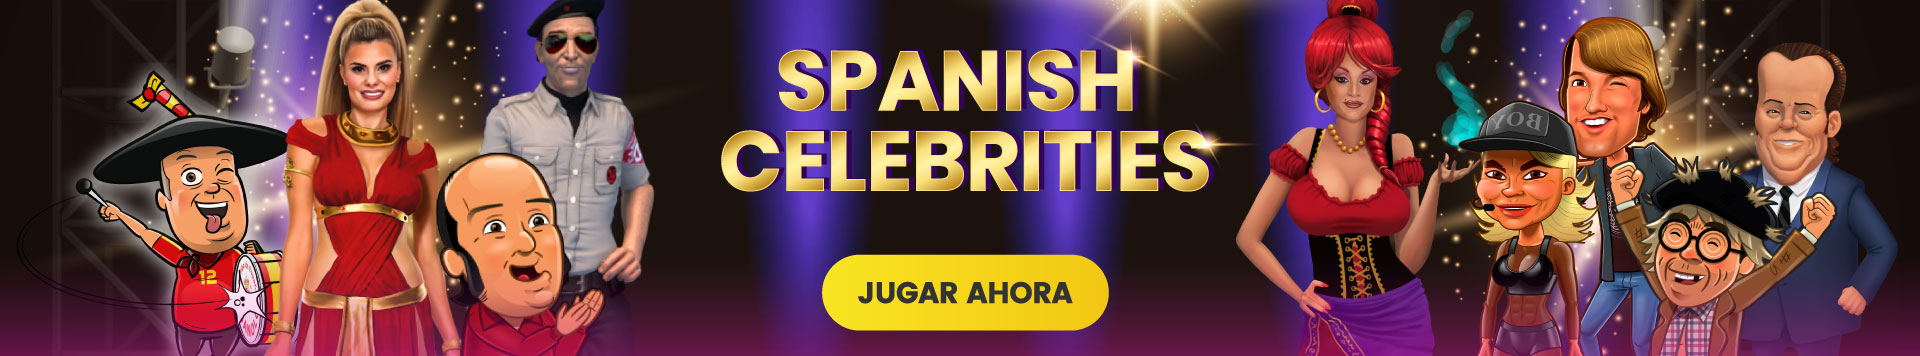 MGA - Spanish Celebrities PRE